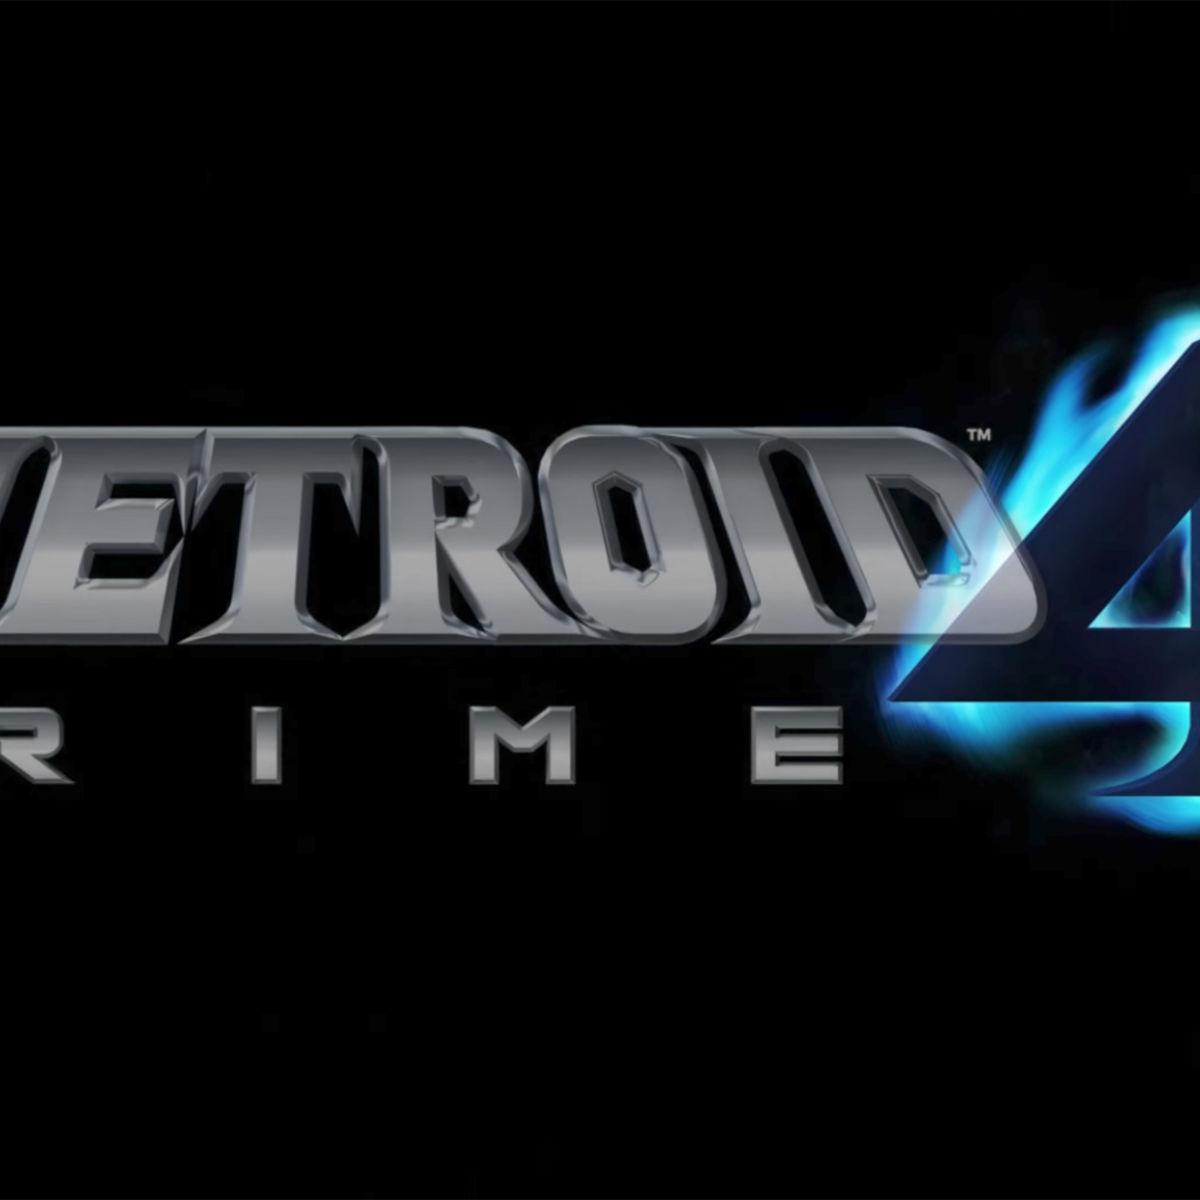 metroid-prime-4-logo-fix.jpg